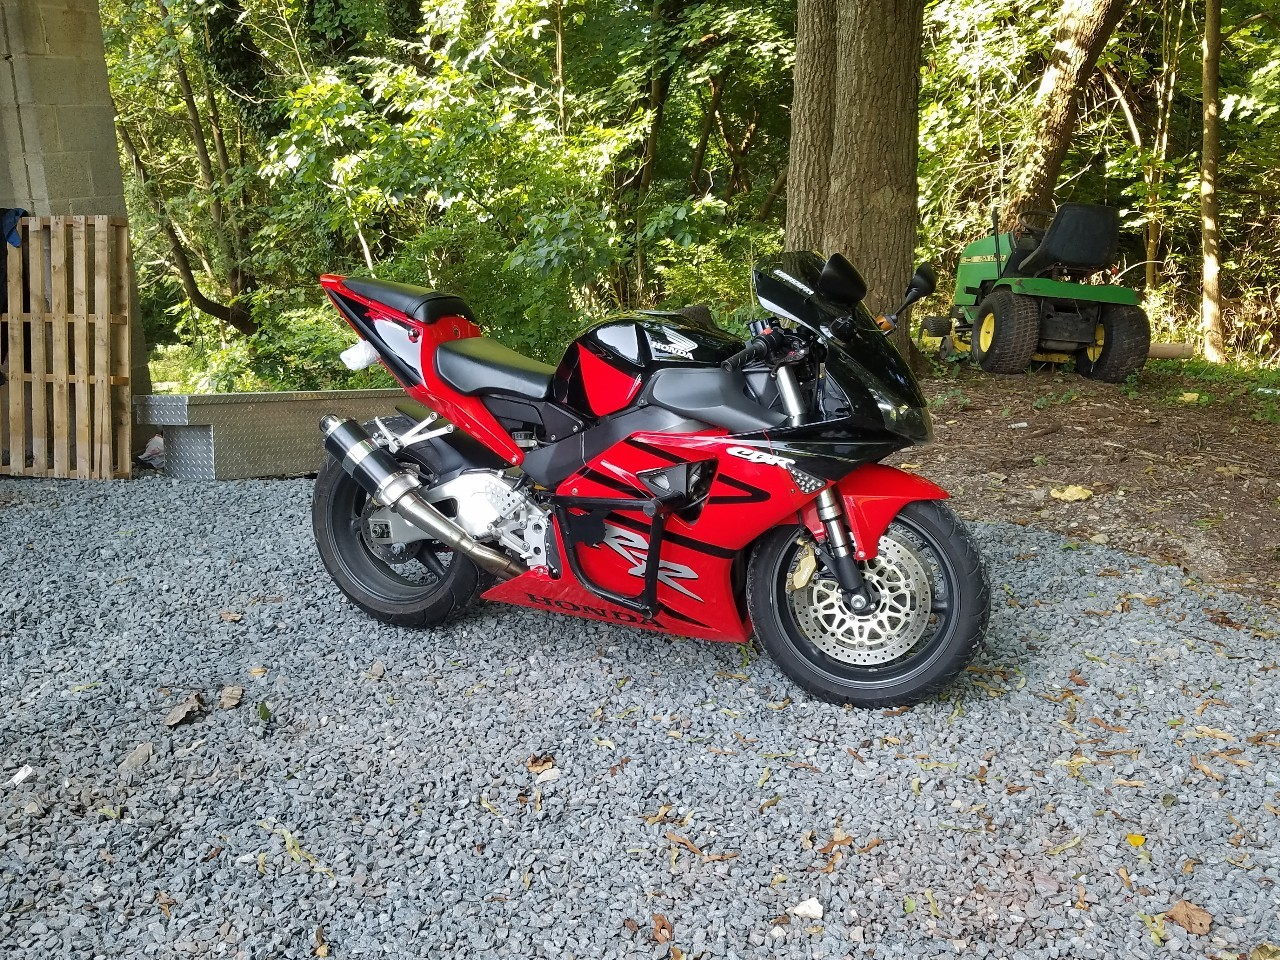 Pennsylvania - Used Honda For Sale - Honda Motorcycle